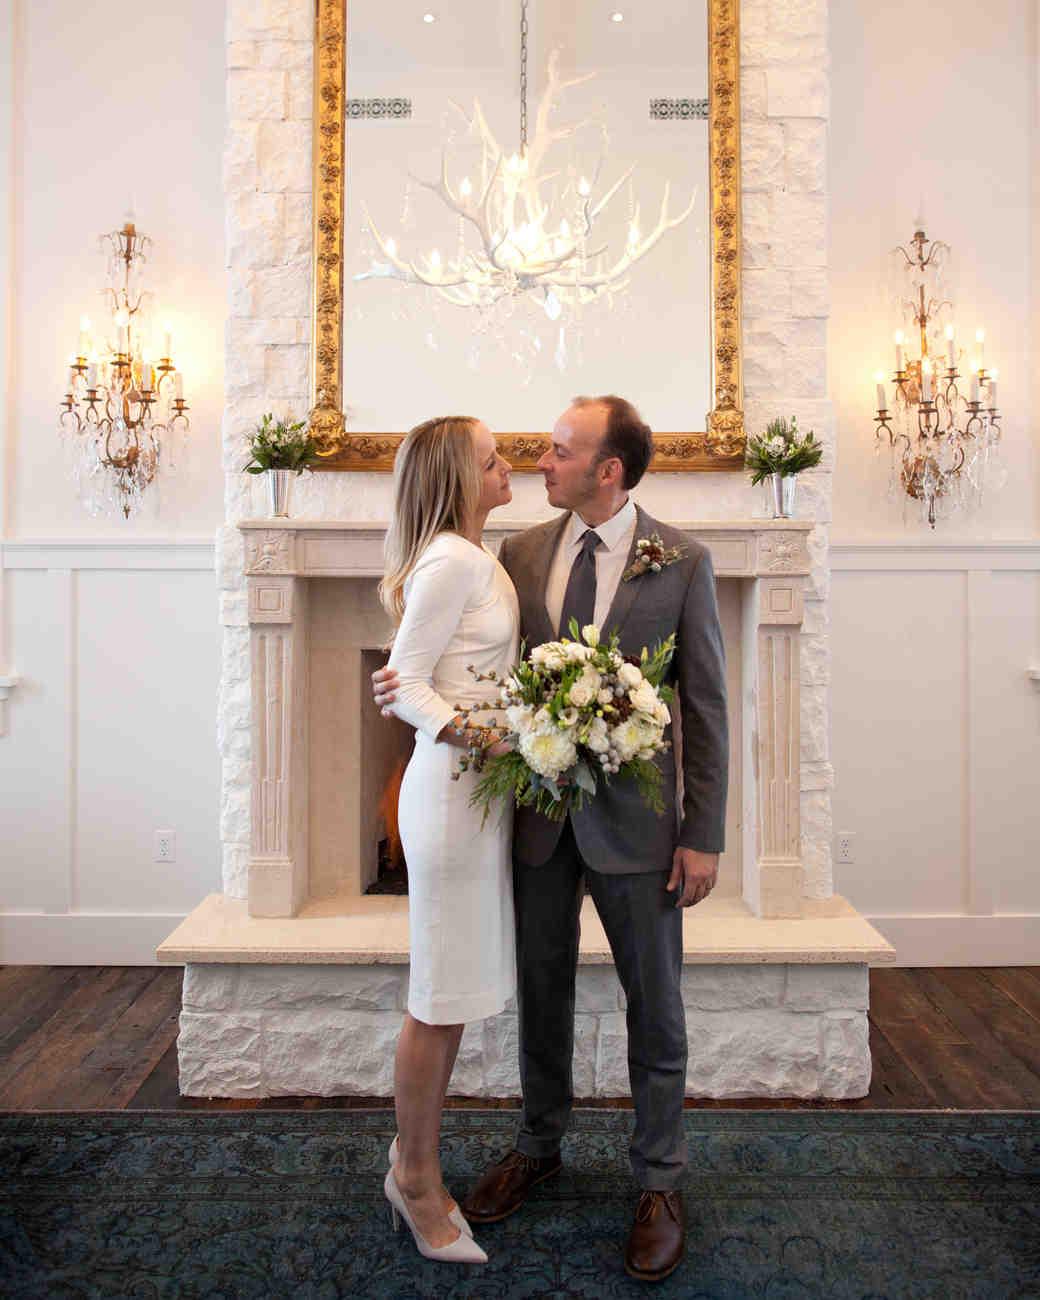 An Intimate Winter Destination Wedding In Park City, Utah